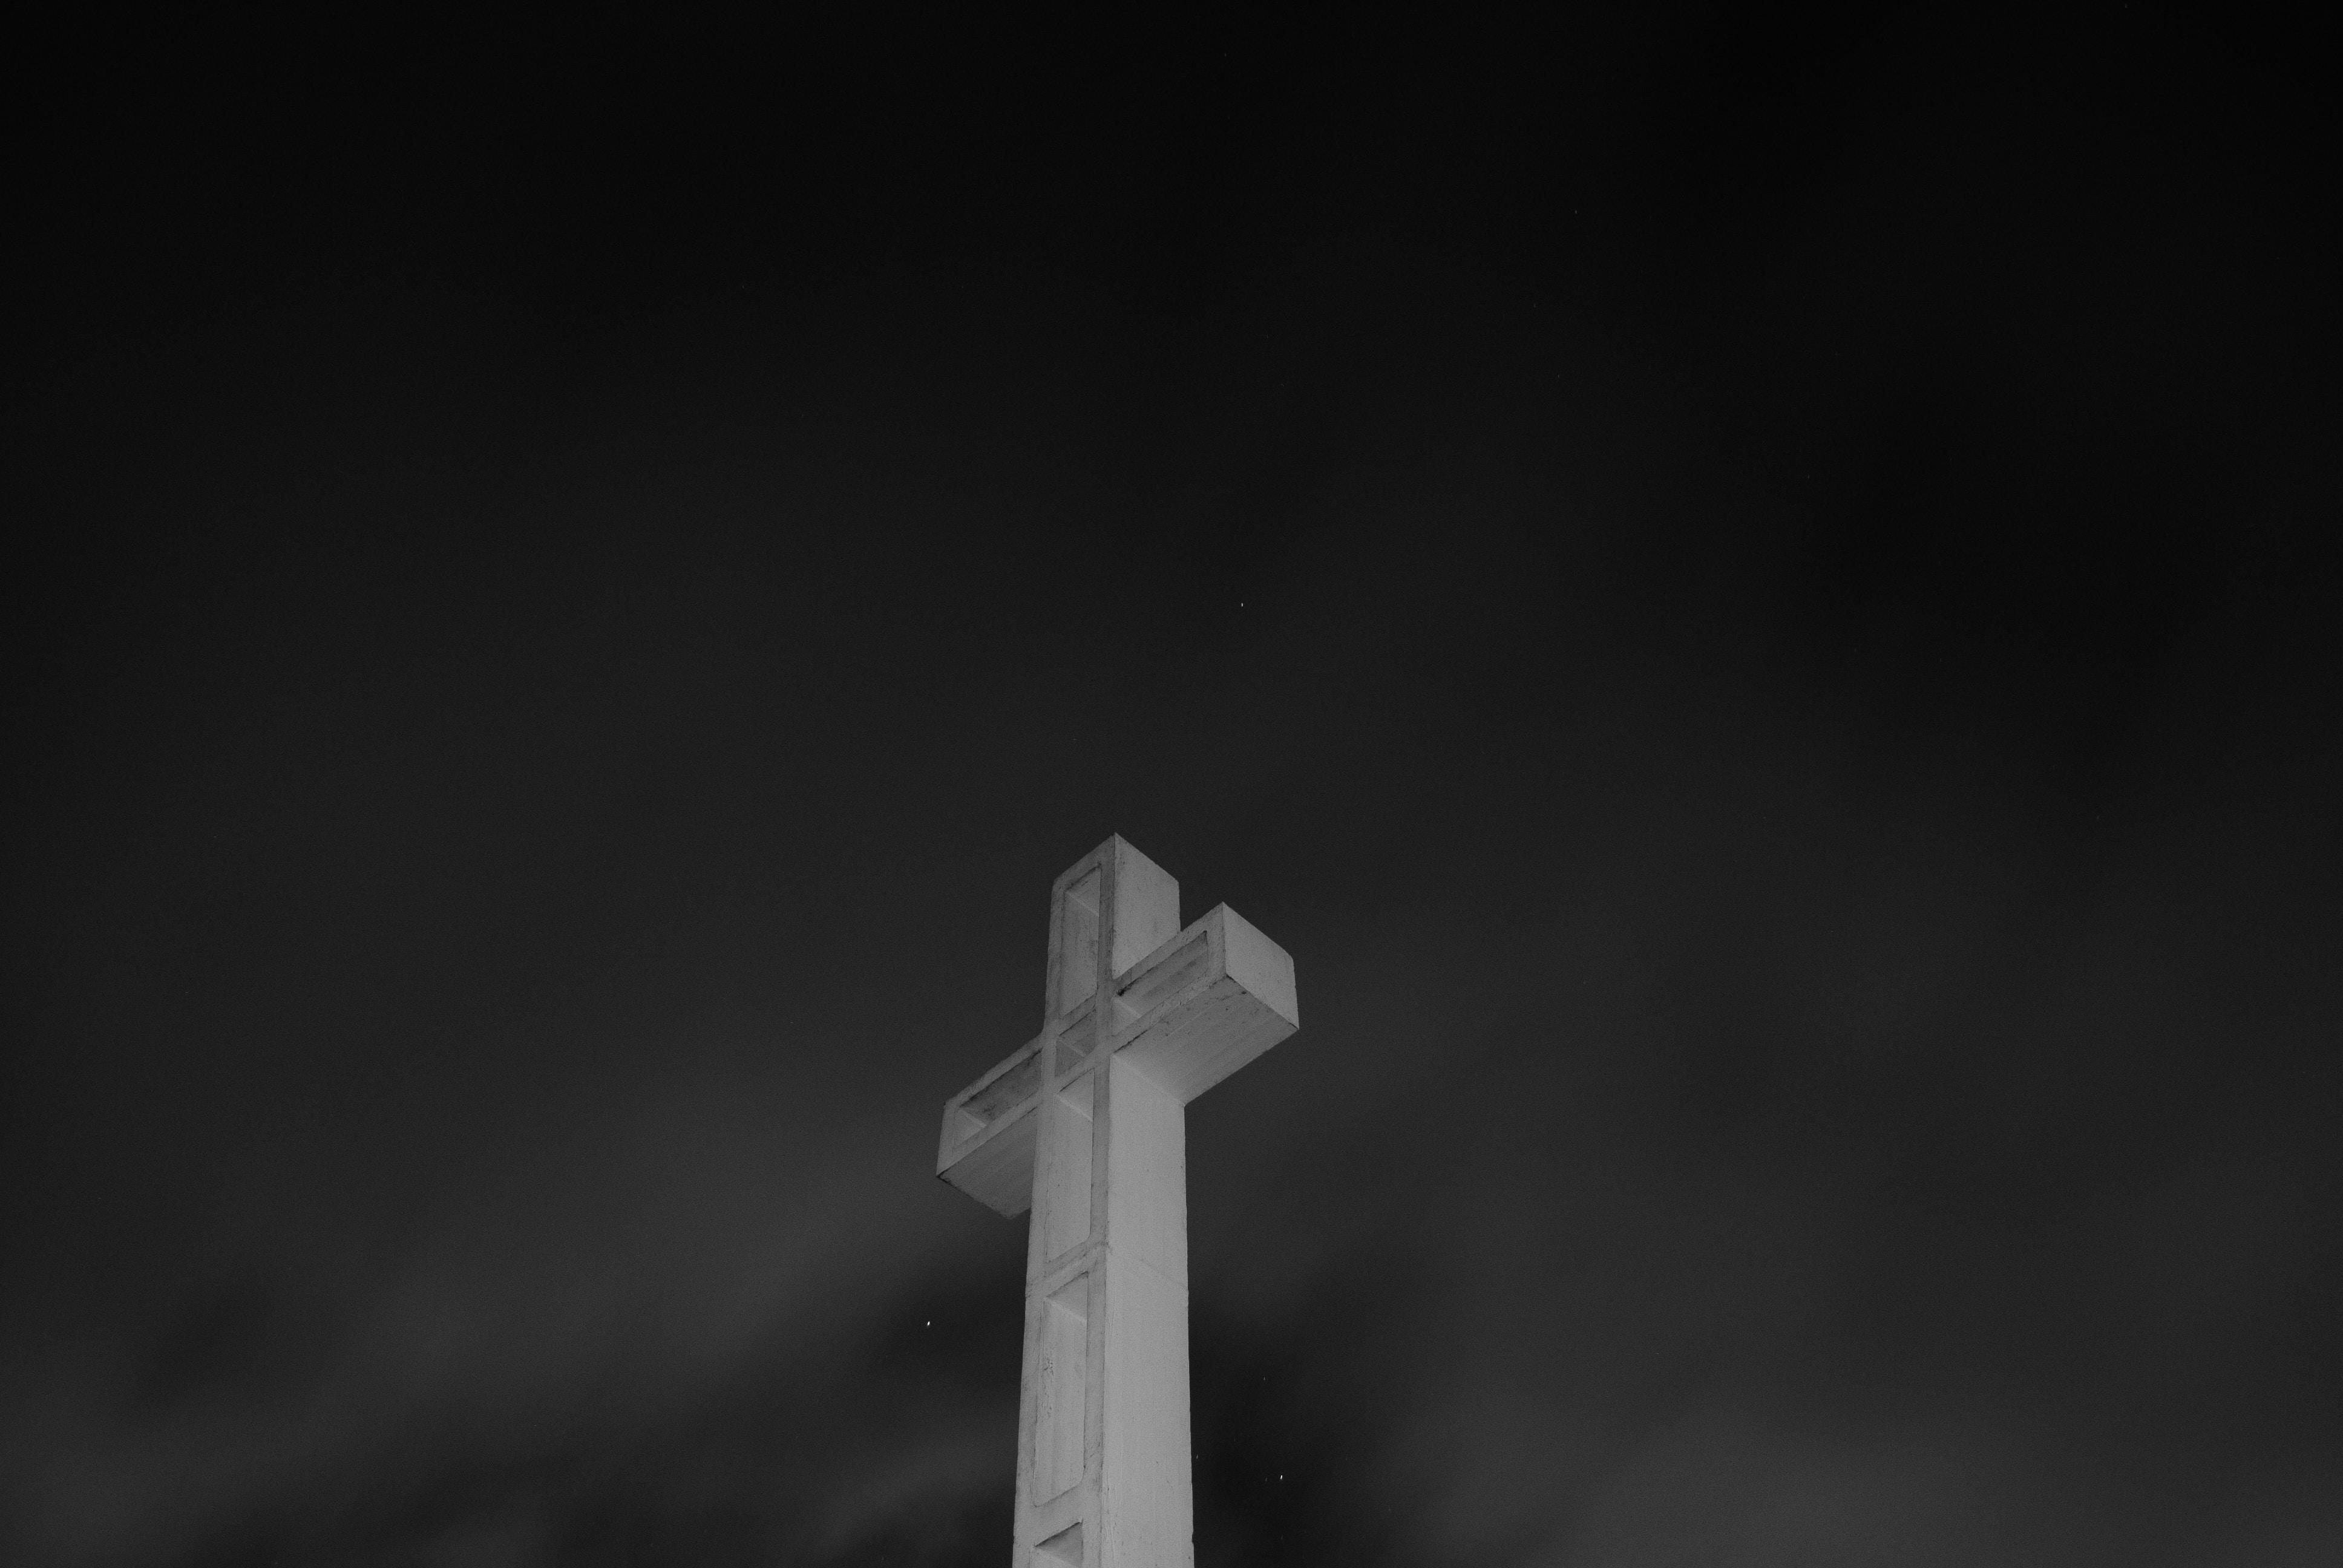 Black and white shot of white cross on Soledad Mountain on dark sky background